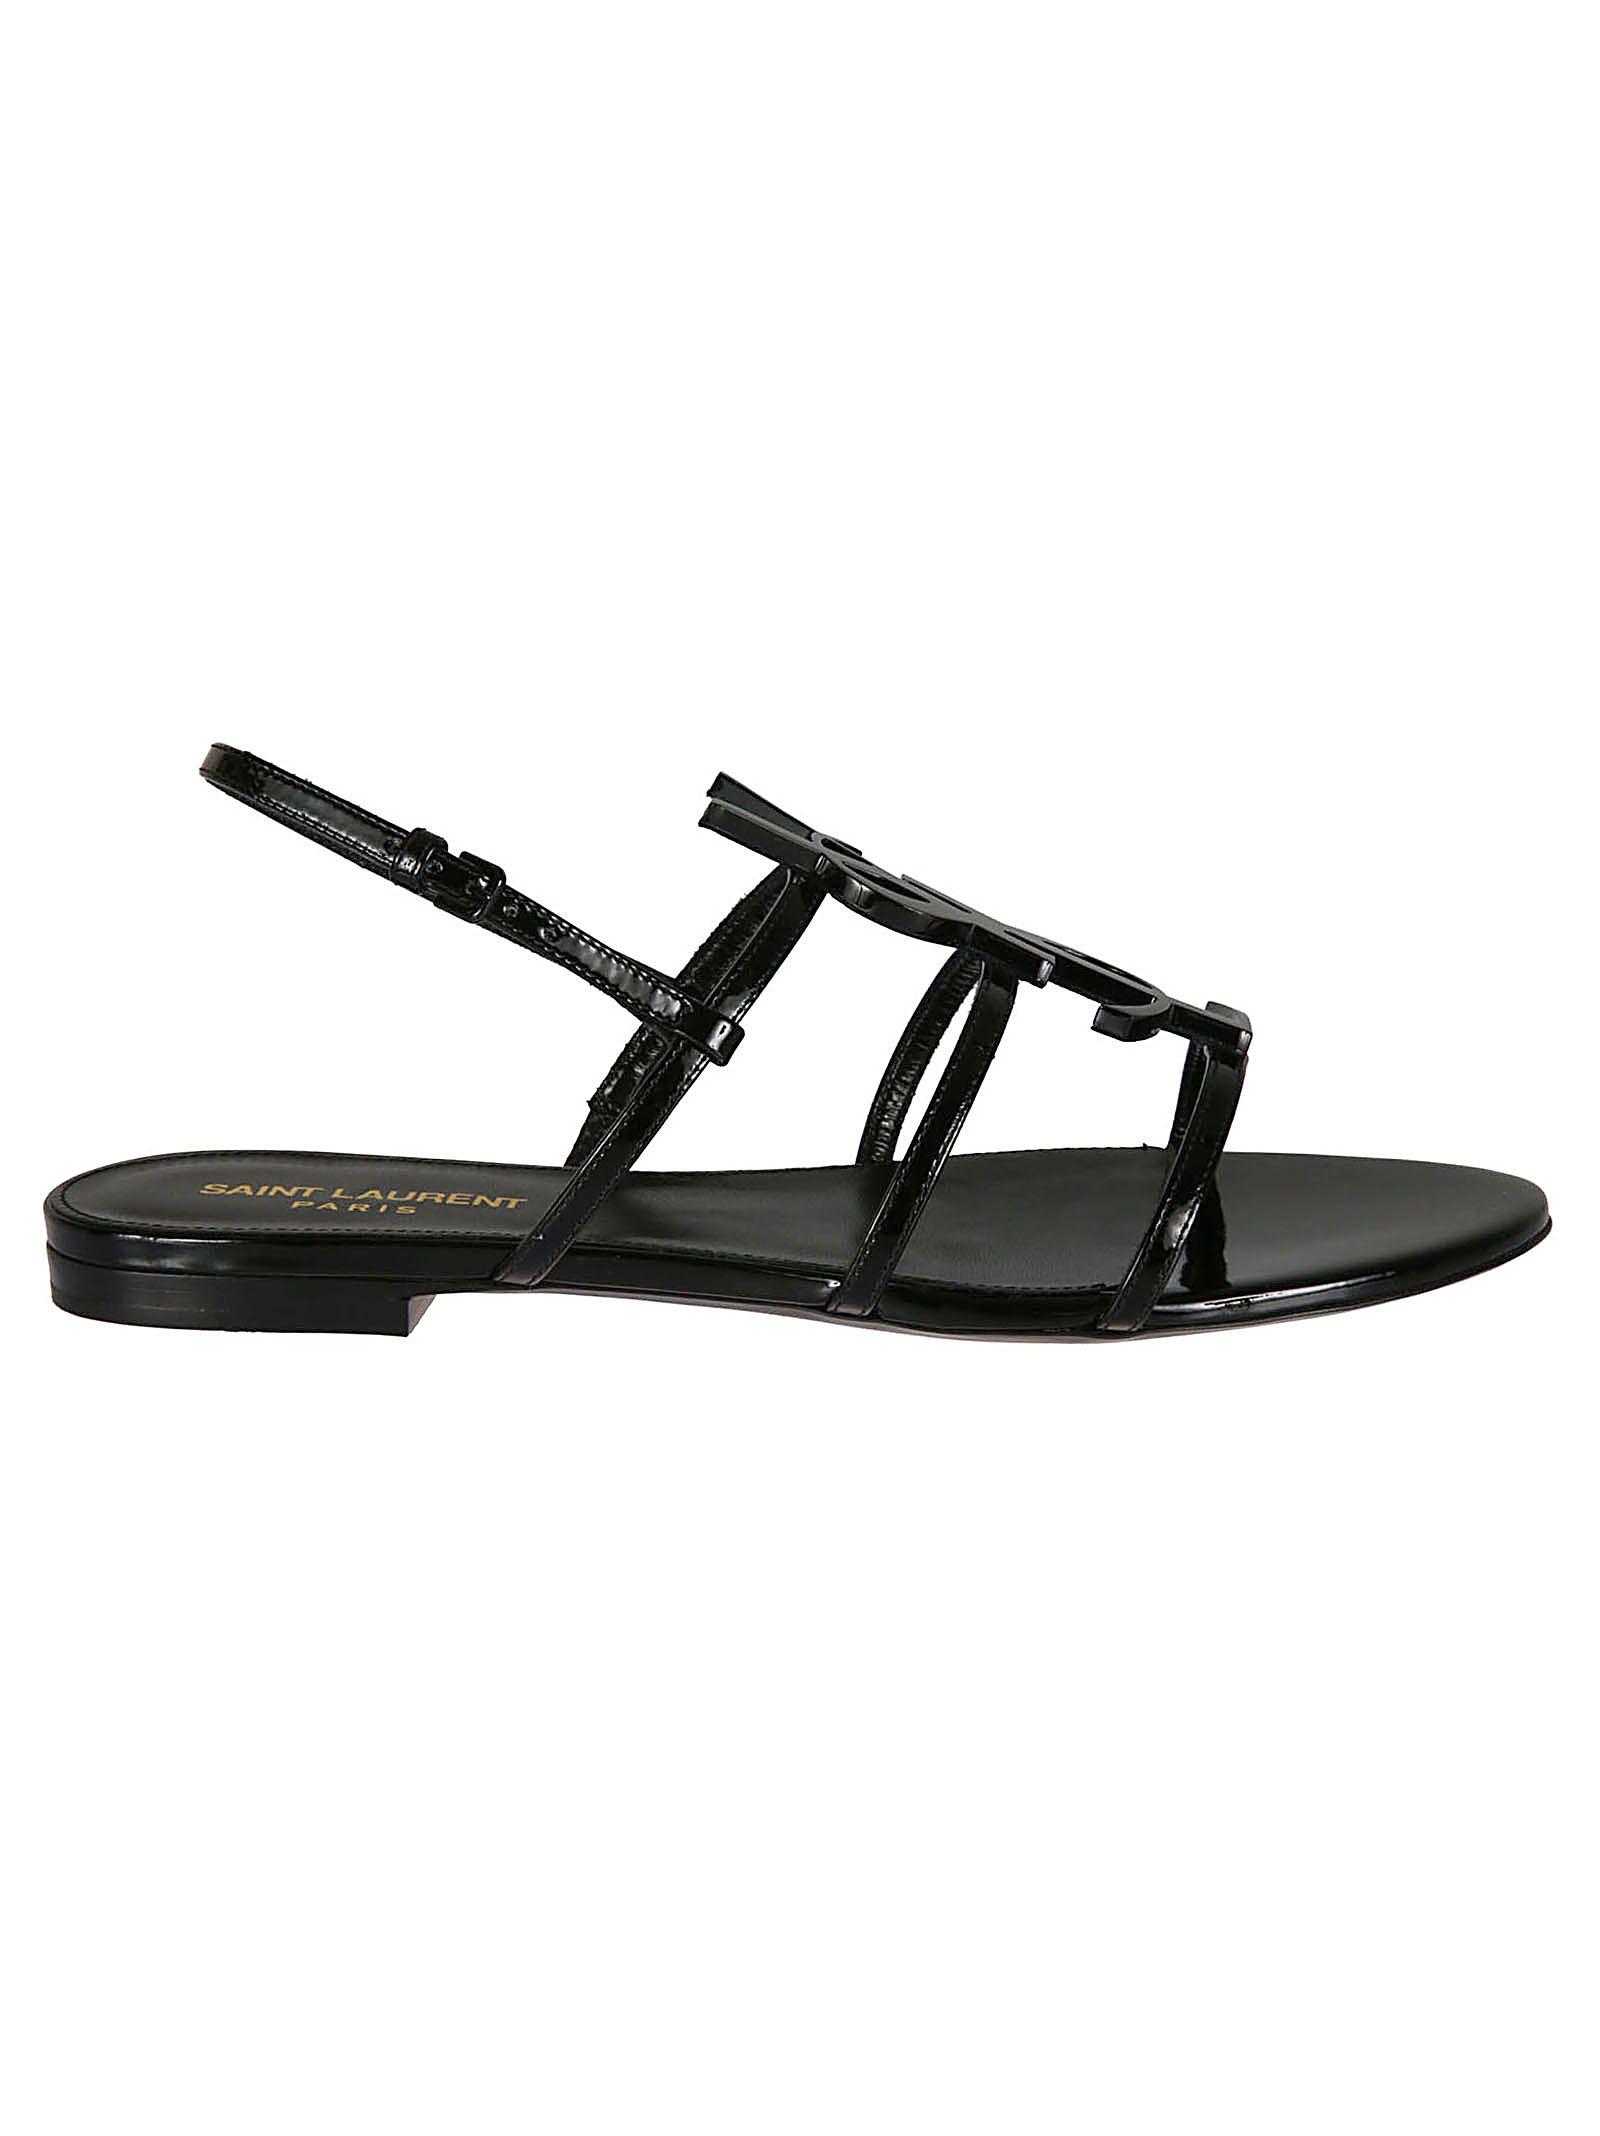 fc947a1f4bc7 Saint Laurent Saint Laurent Cassandra 05 Ysl Flat Sandals - Black ...